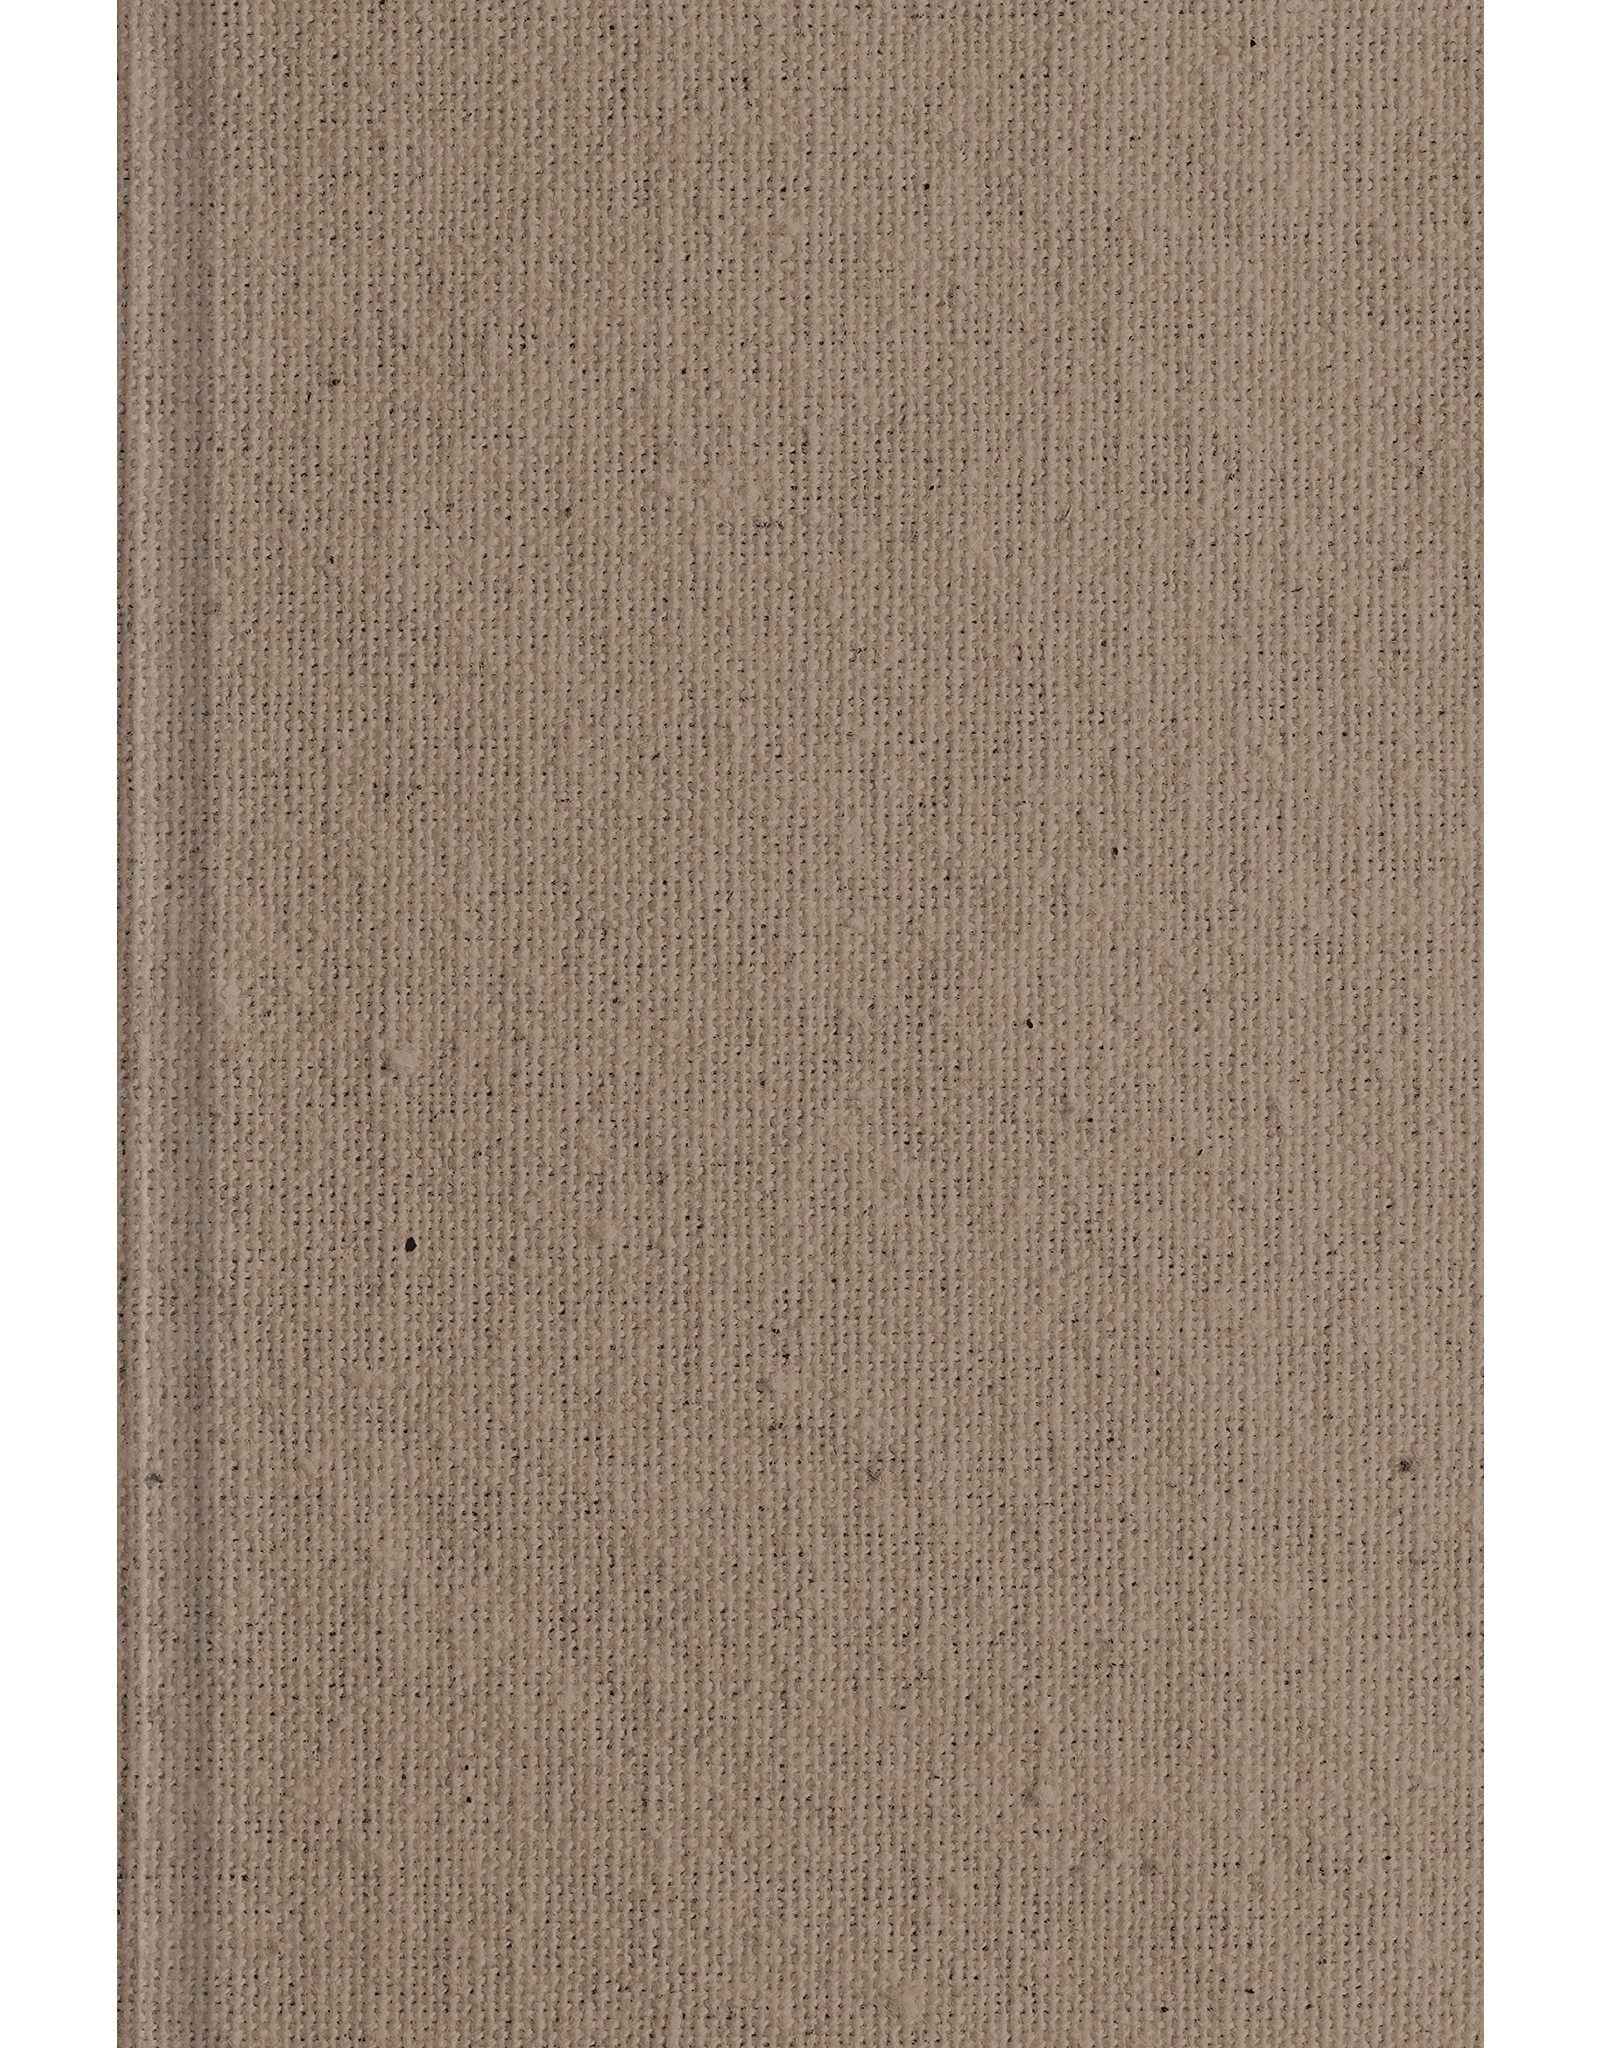 Crossway / Good News ESV Study Bible, Personal Size Cloth Board Tan